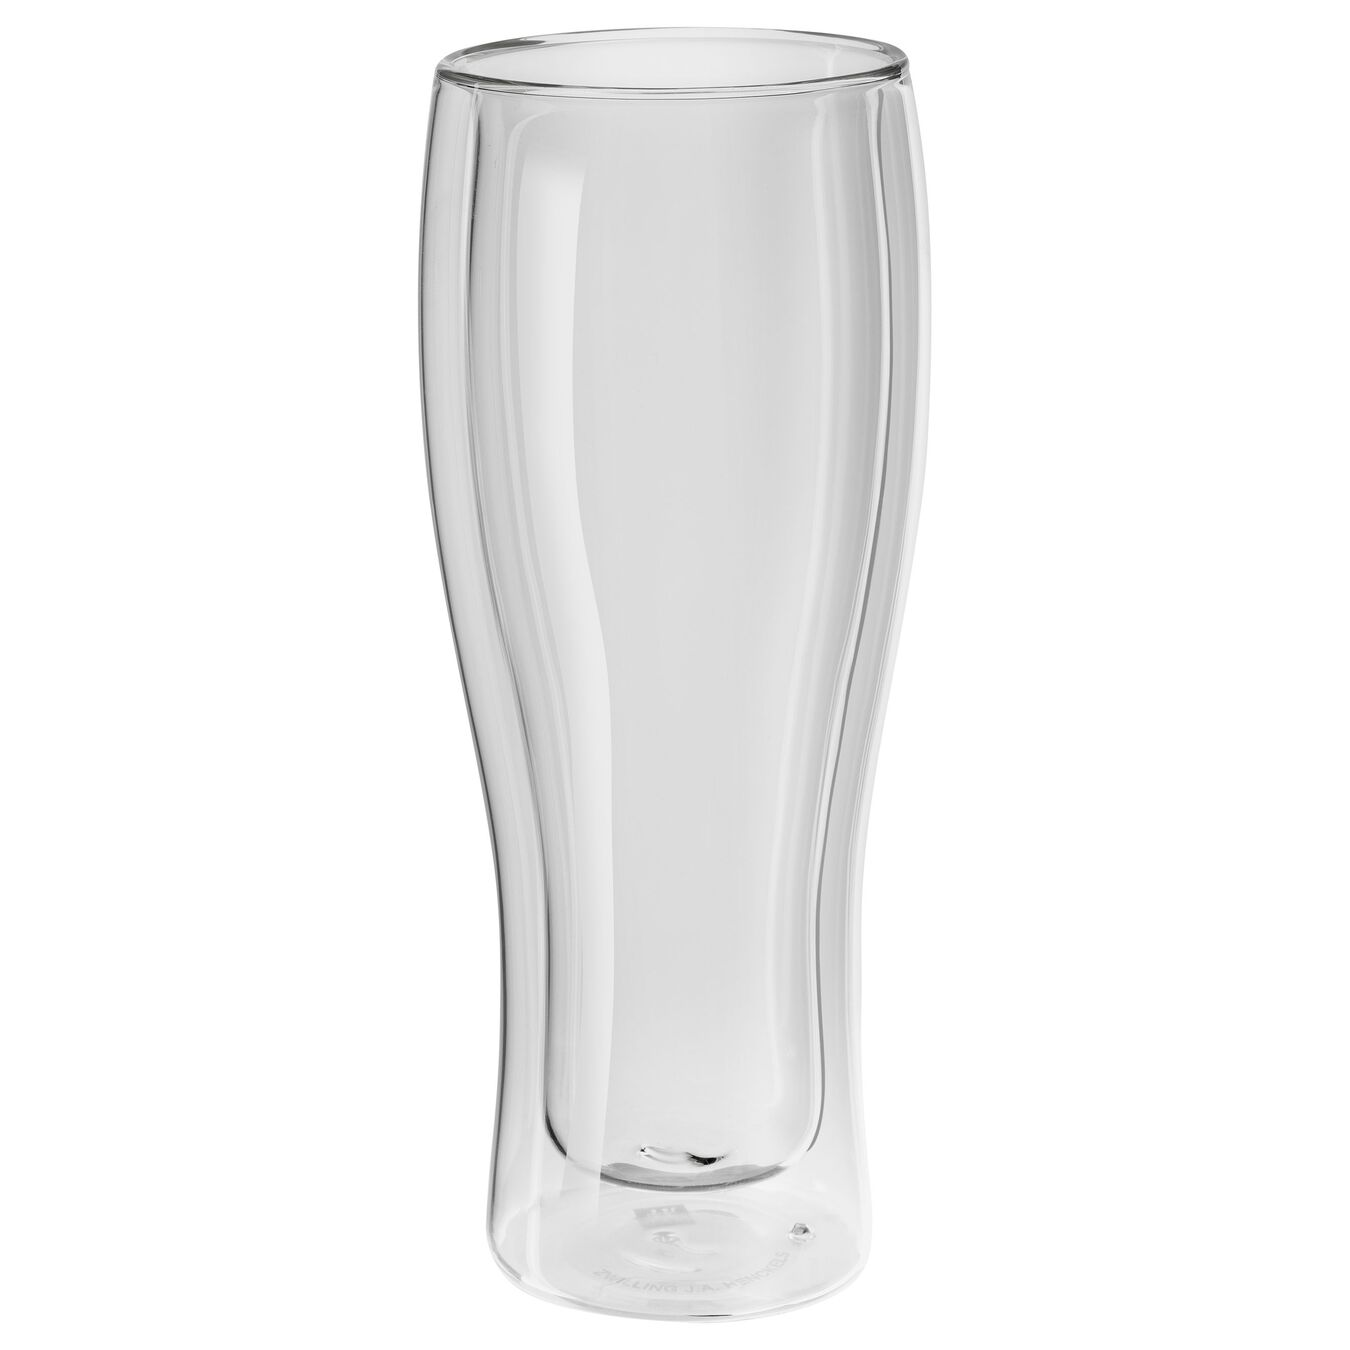 4 Piece Beer glass set,,large 5